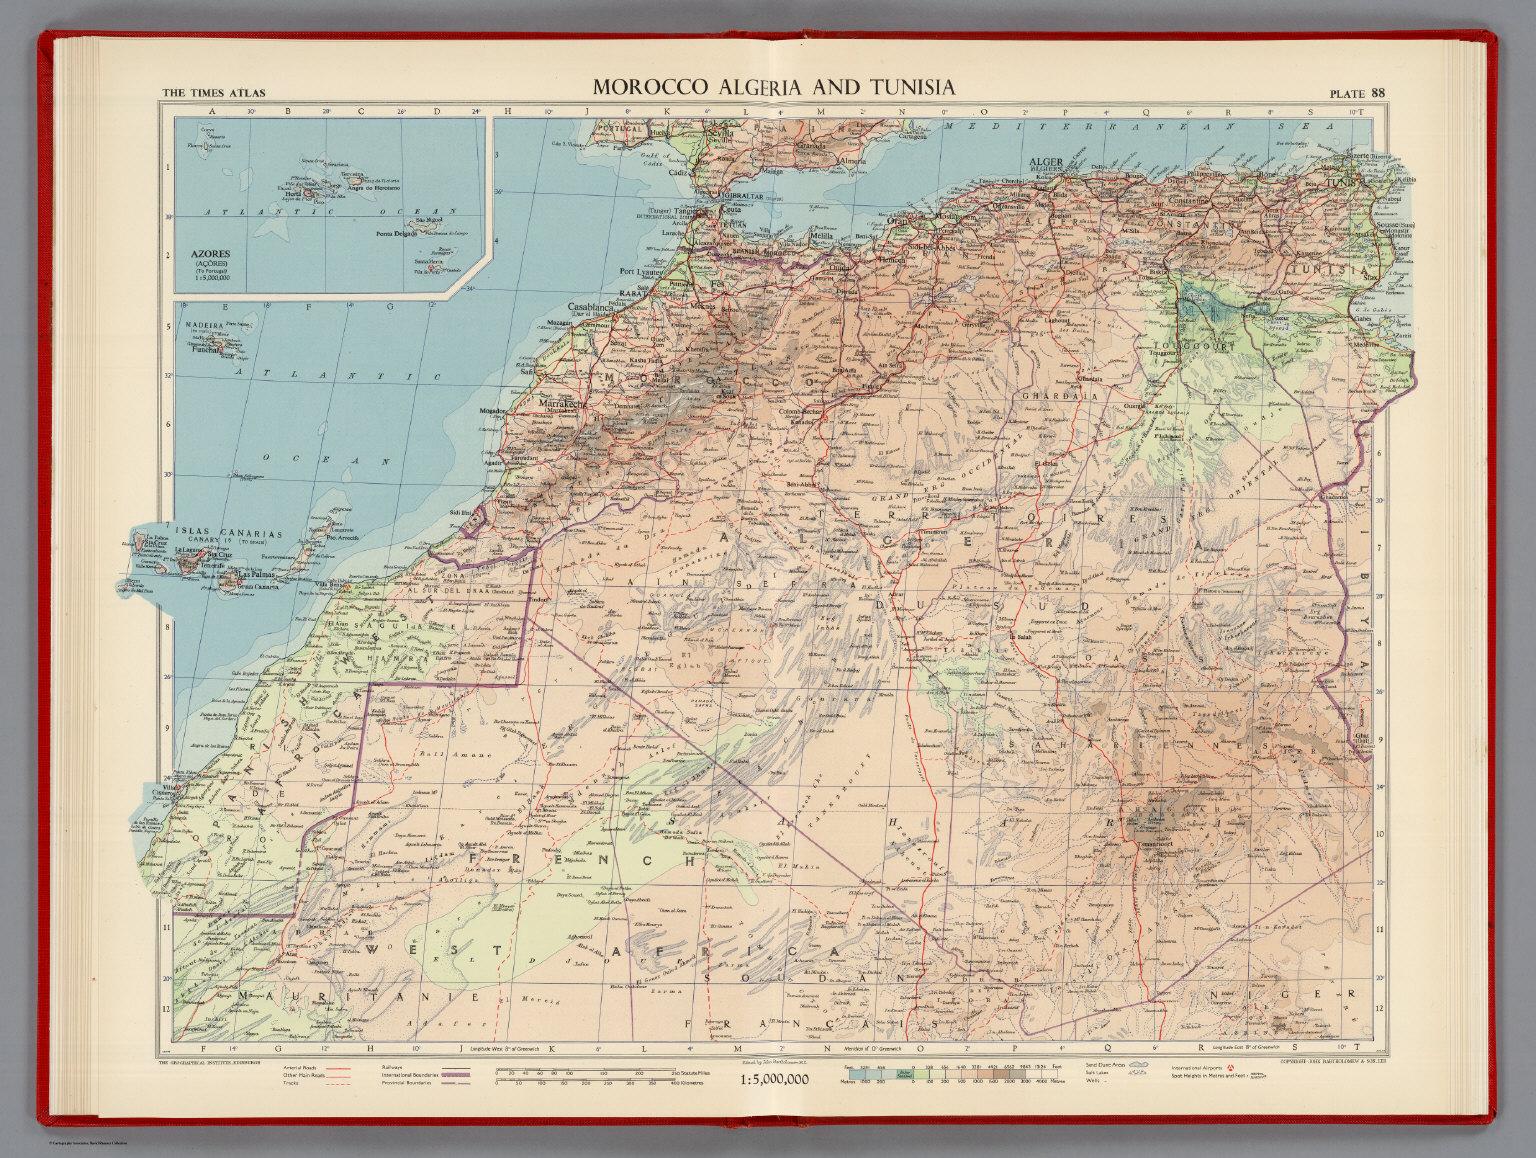 Morocco algeria and tunisia plate 88 v iv david rumsey morocco algeria and tunisia plate 88 v iv gumiabroncs Image collections